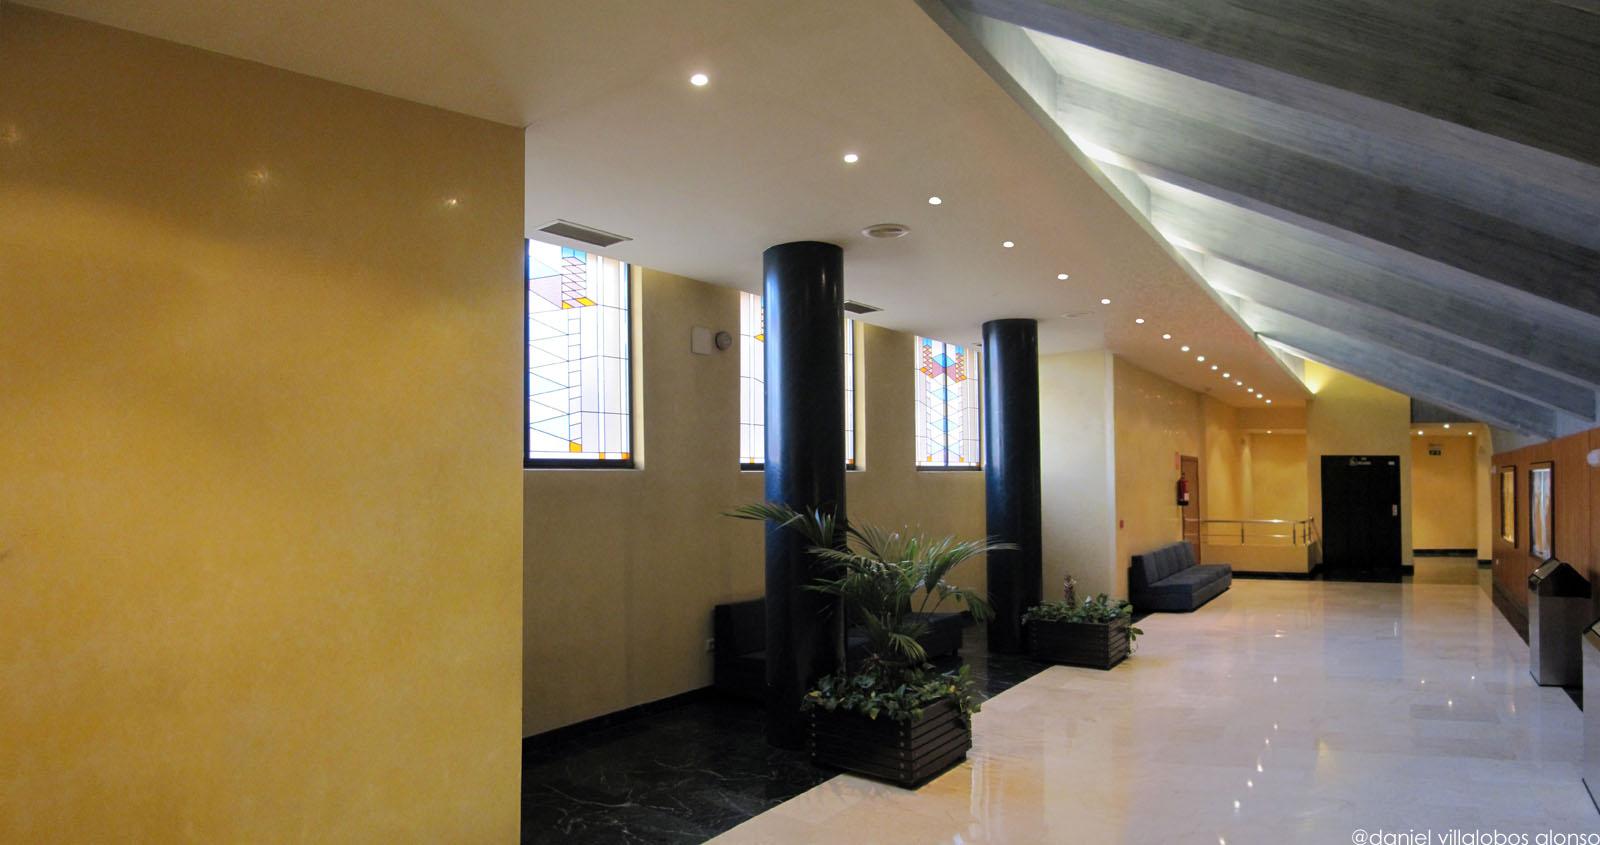 danielvillalobos-cines-digitalphotographies-modernarchitecture-47